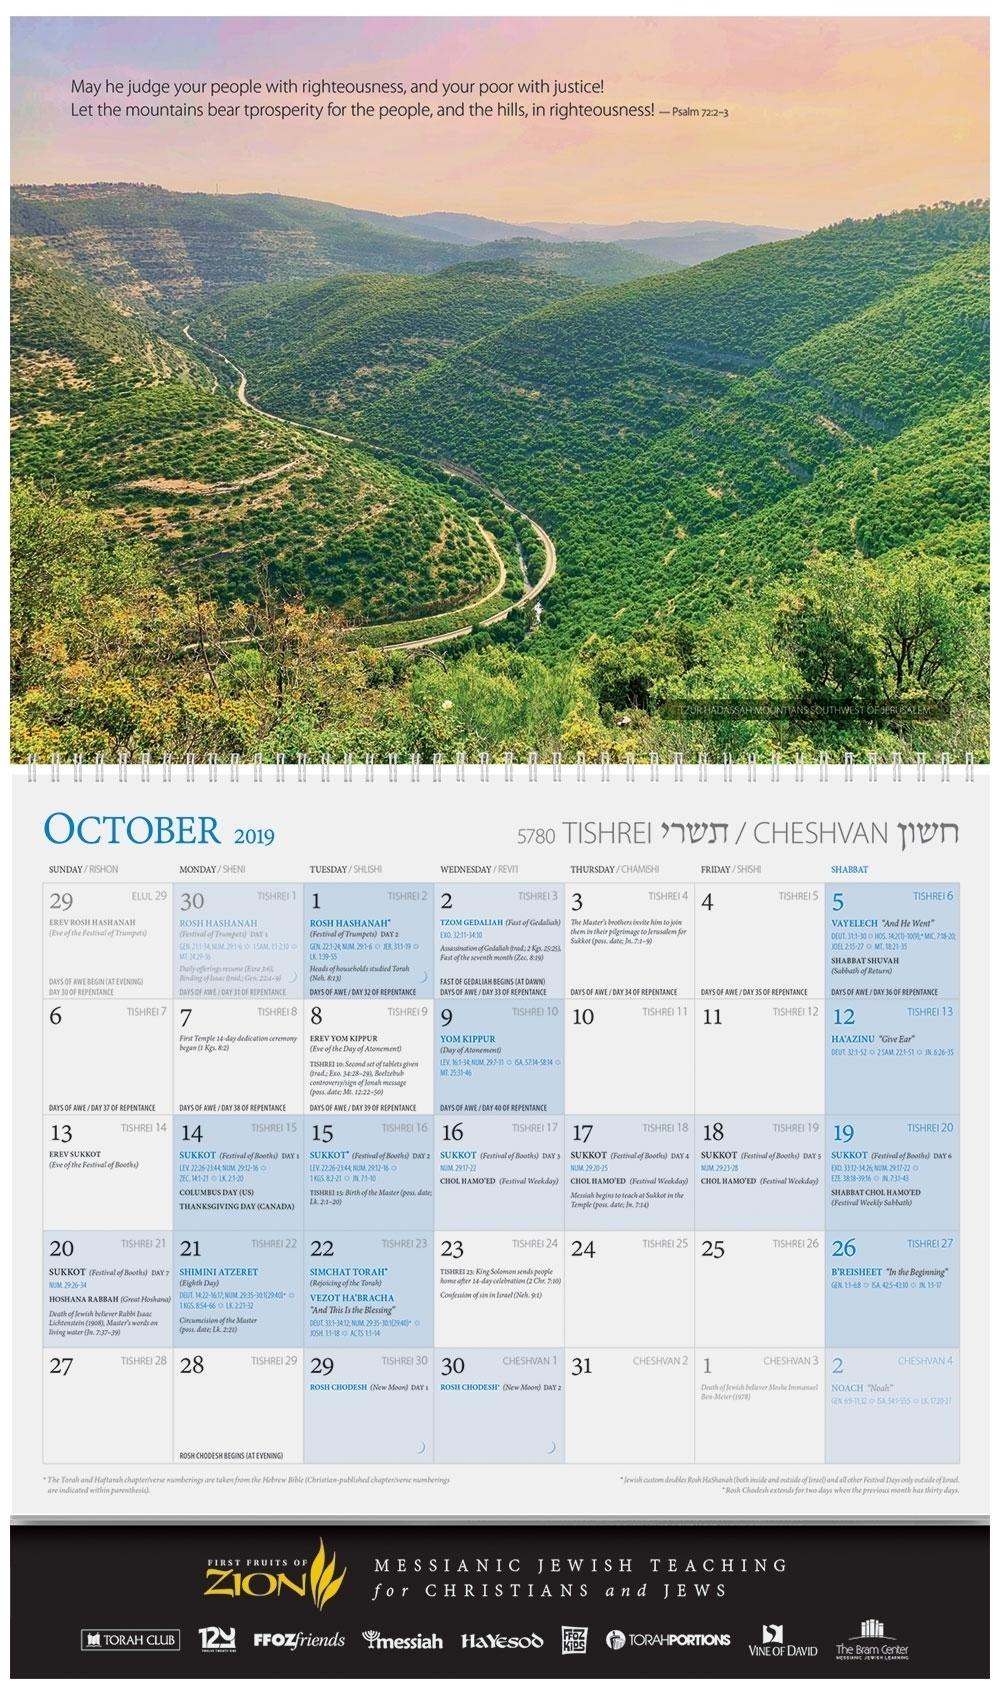 Weekly Torah Parsha Calendar For 2019/2020 - Calendar inside Weekly Torah Reading Portions Calendar